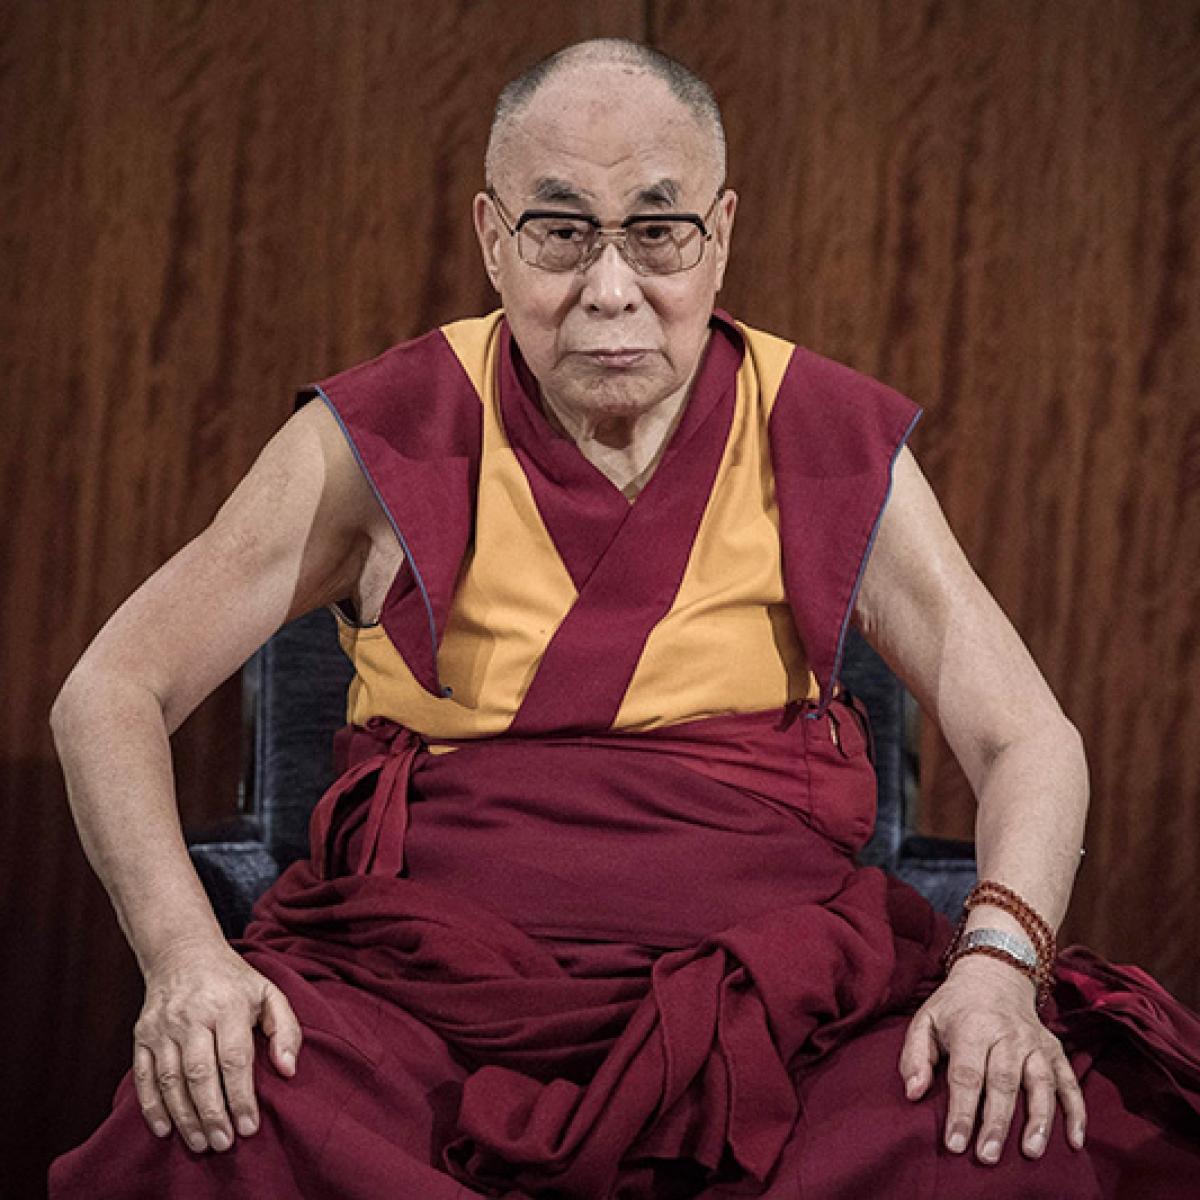 Dalai Lama's ex-physician Yeshi Dhonden passes away